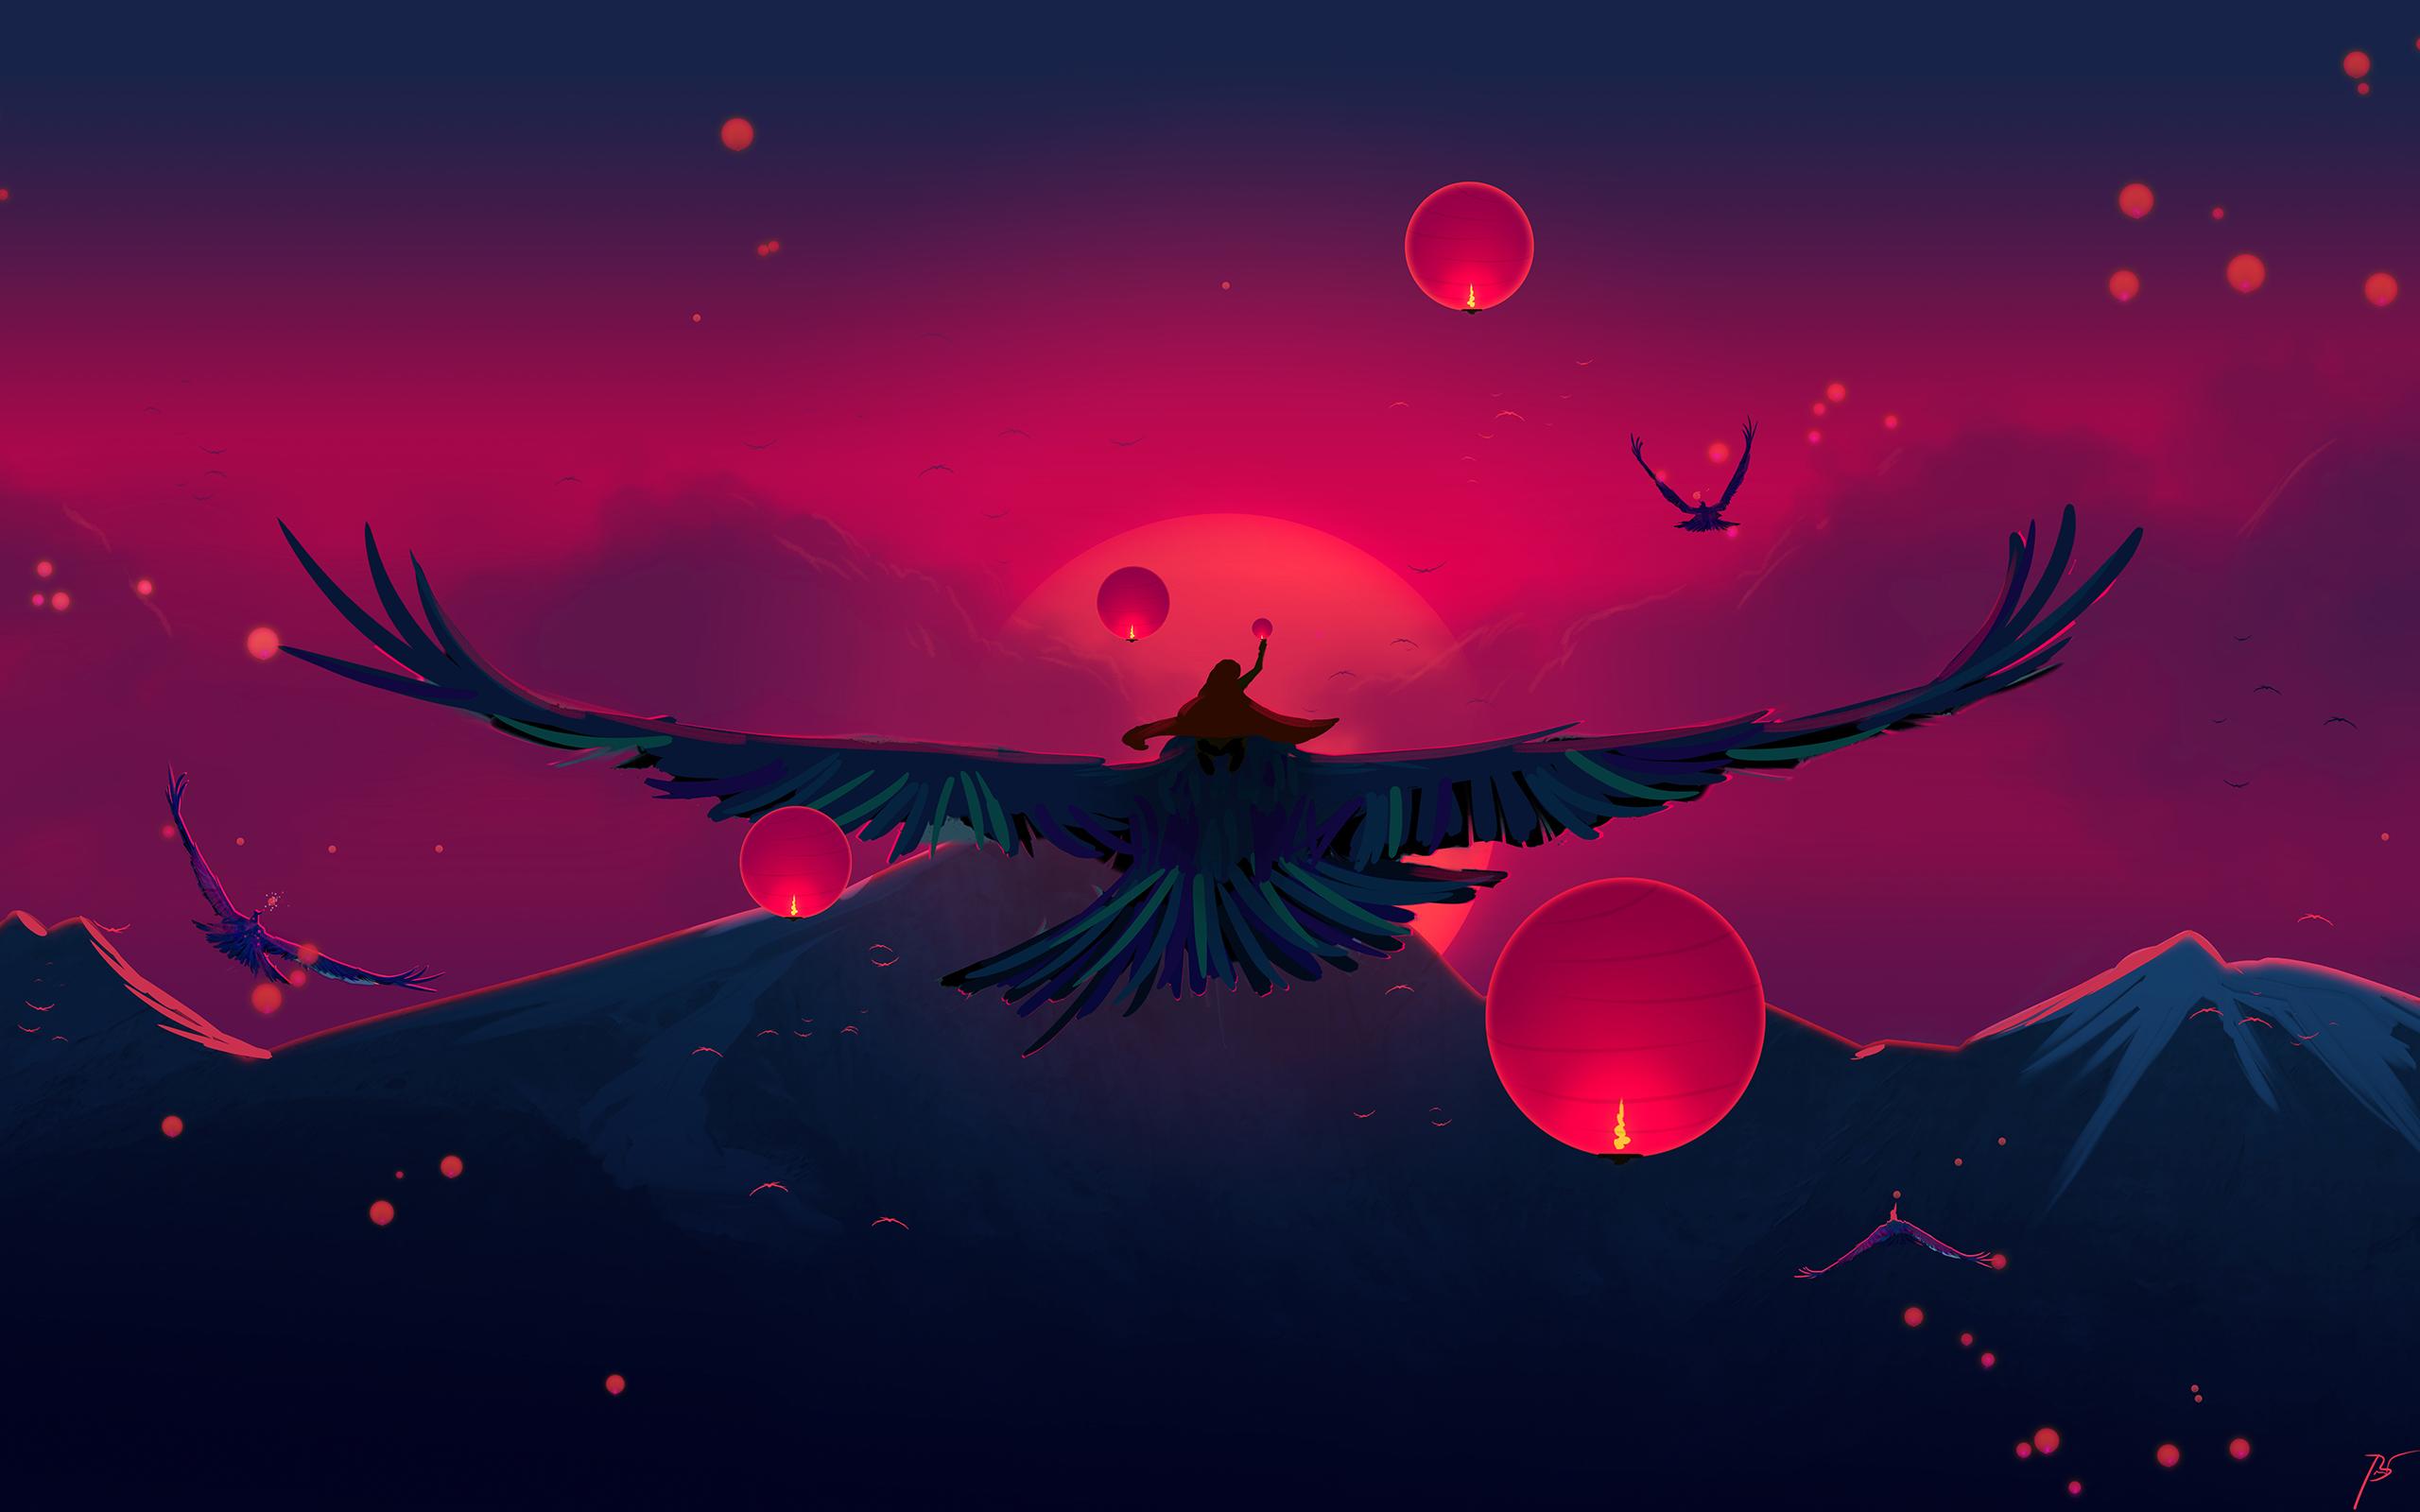 Fantasy Bird 2560x1600